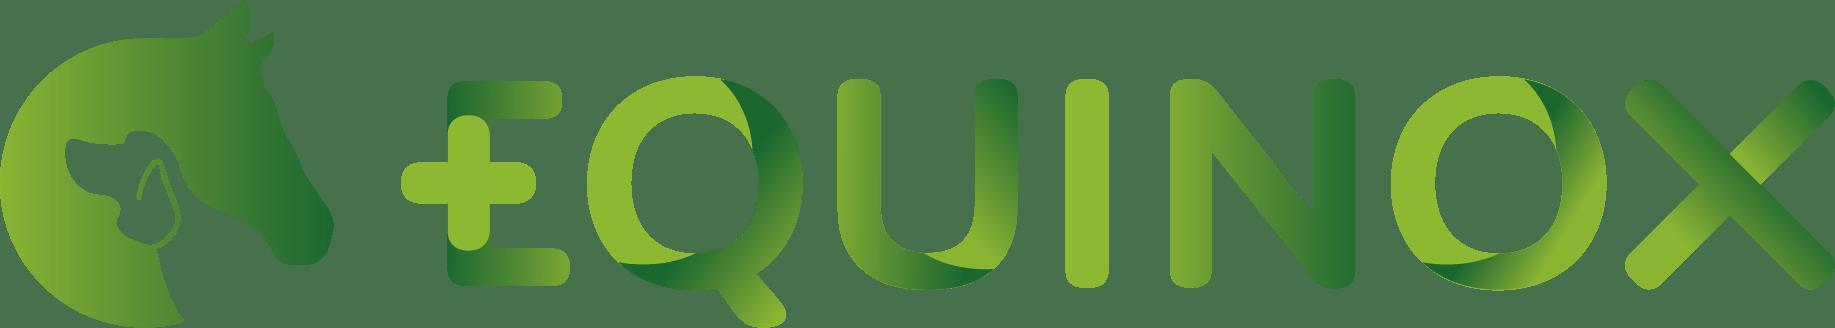 Equinox Healthcare GmbH - Logo